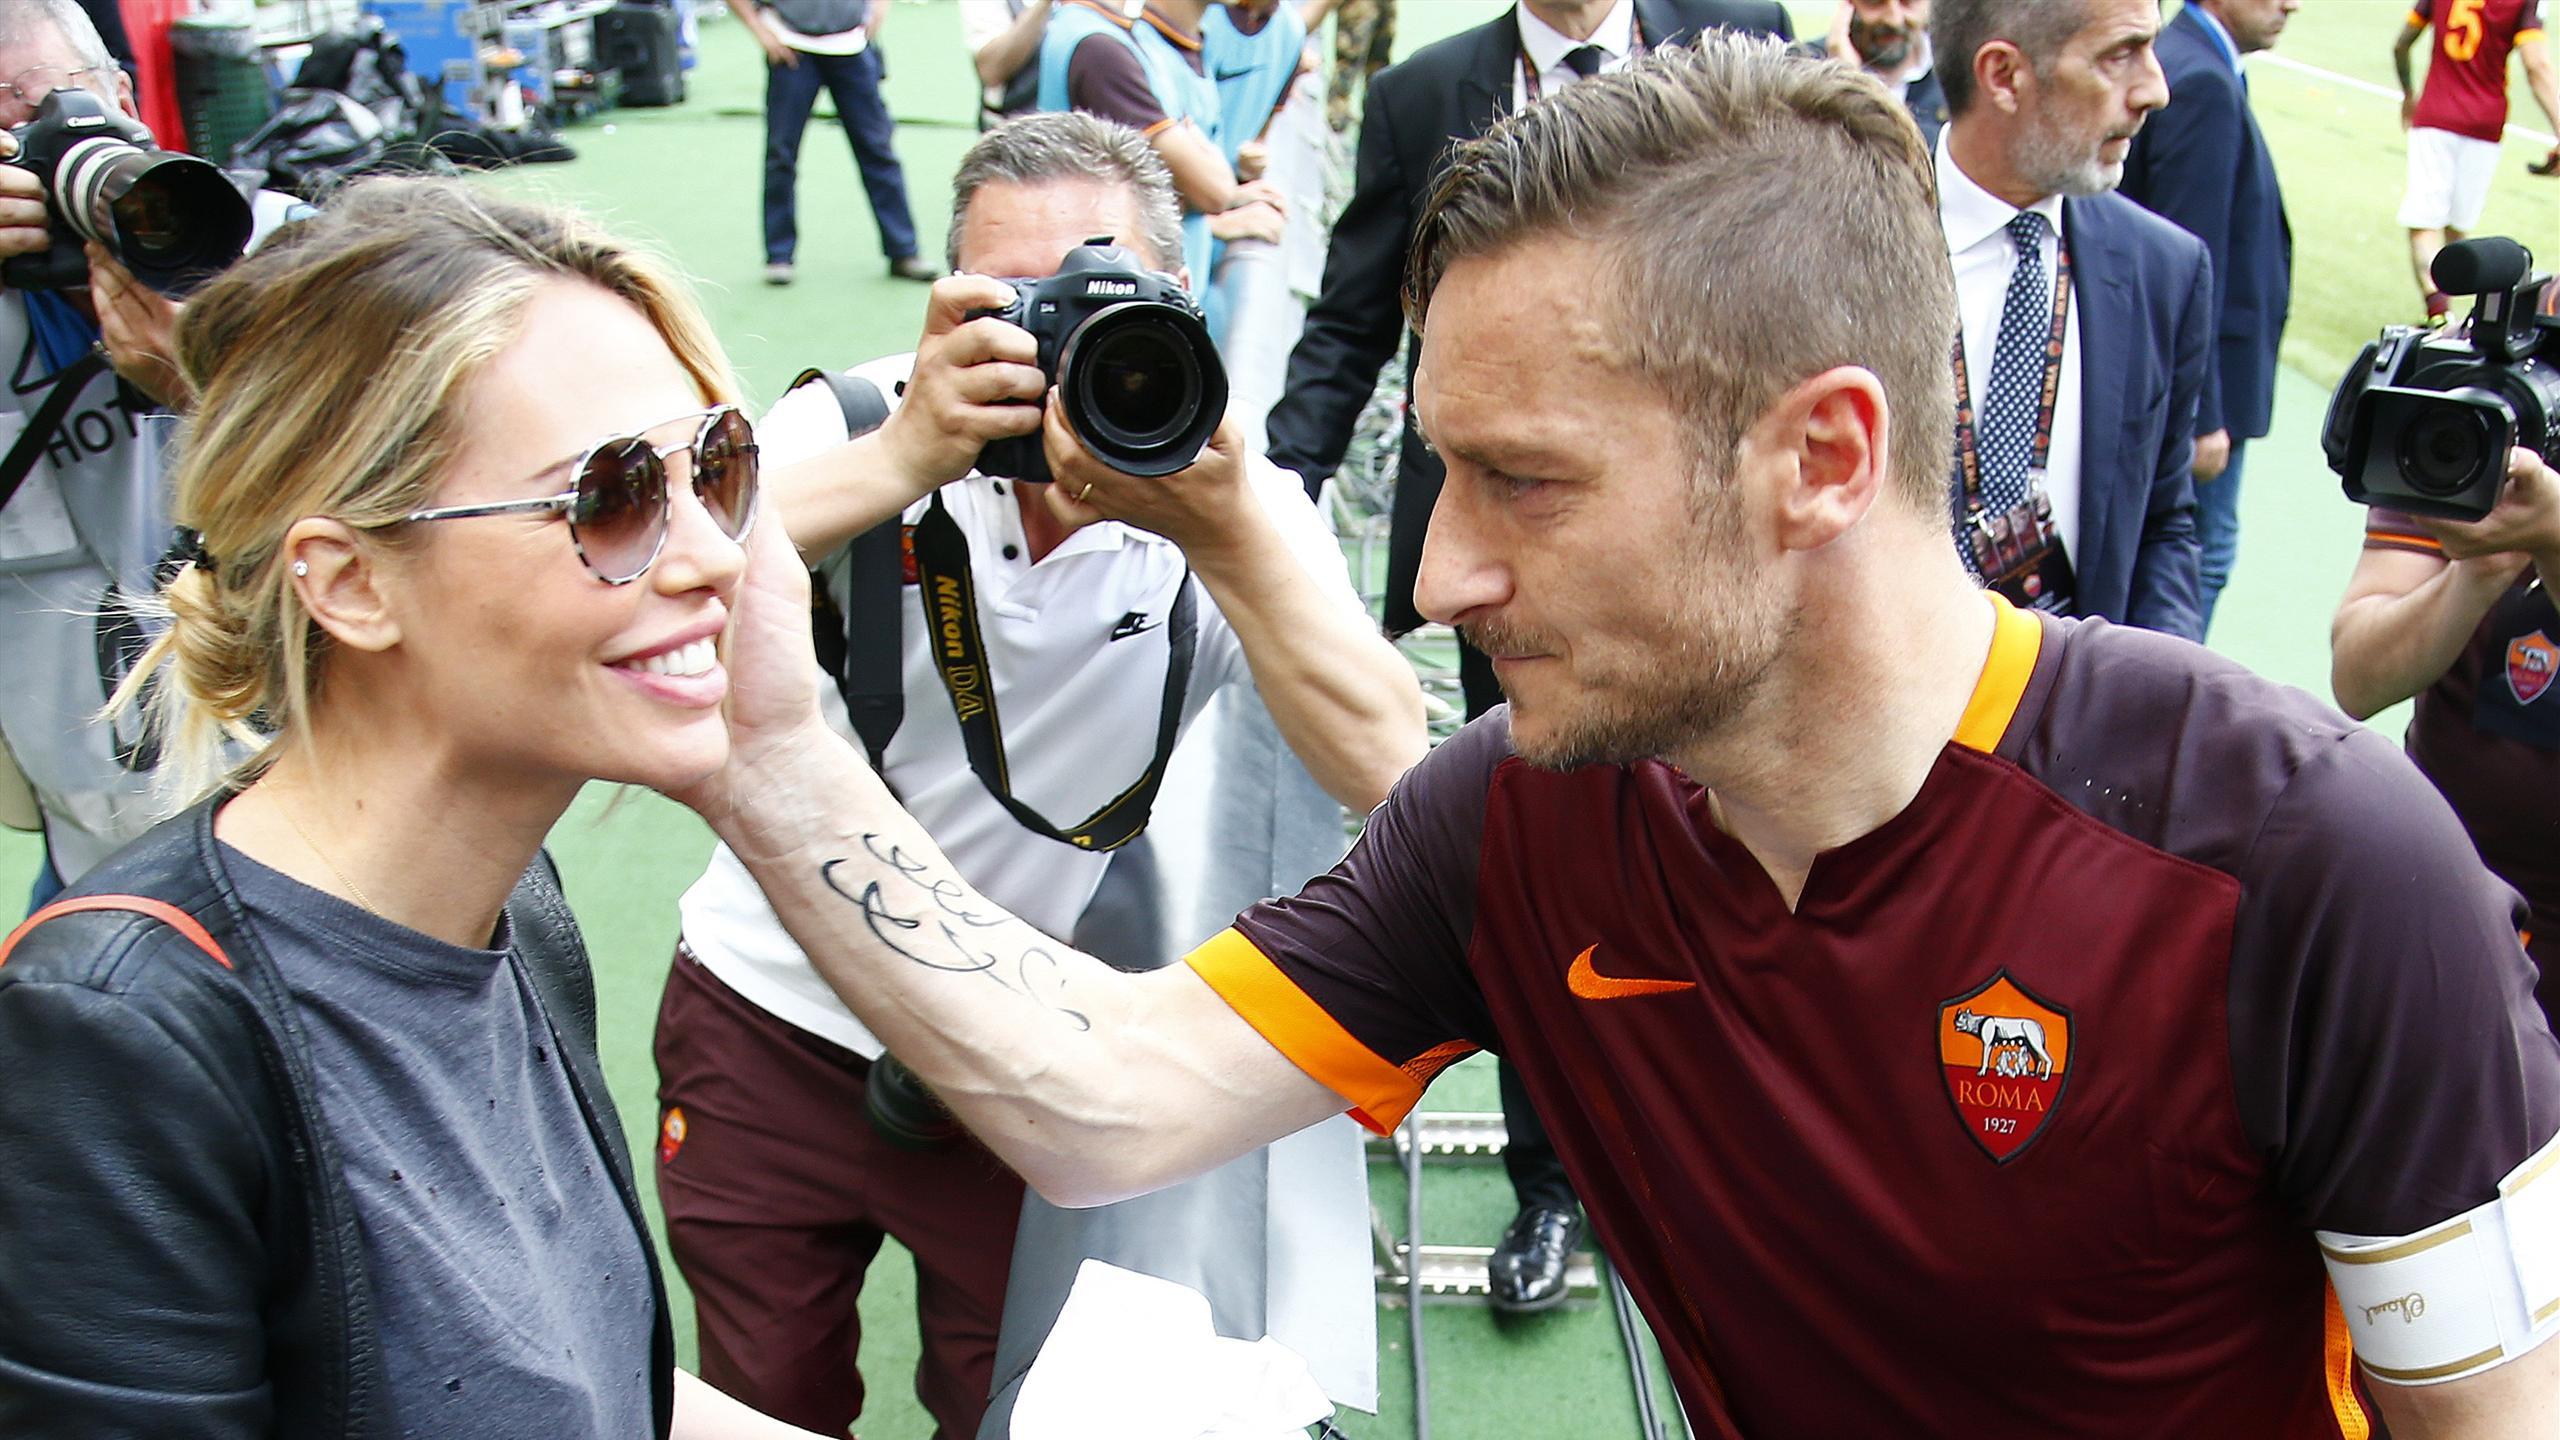 Francesco Totti and his wife Ilary Blasi